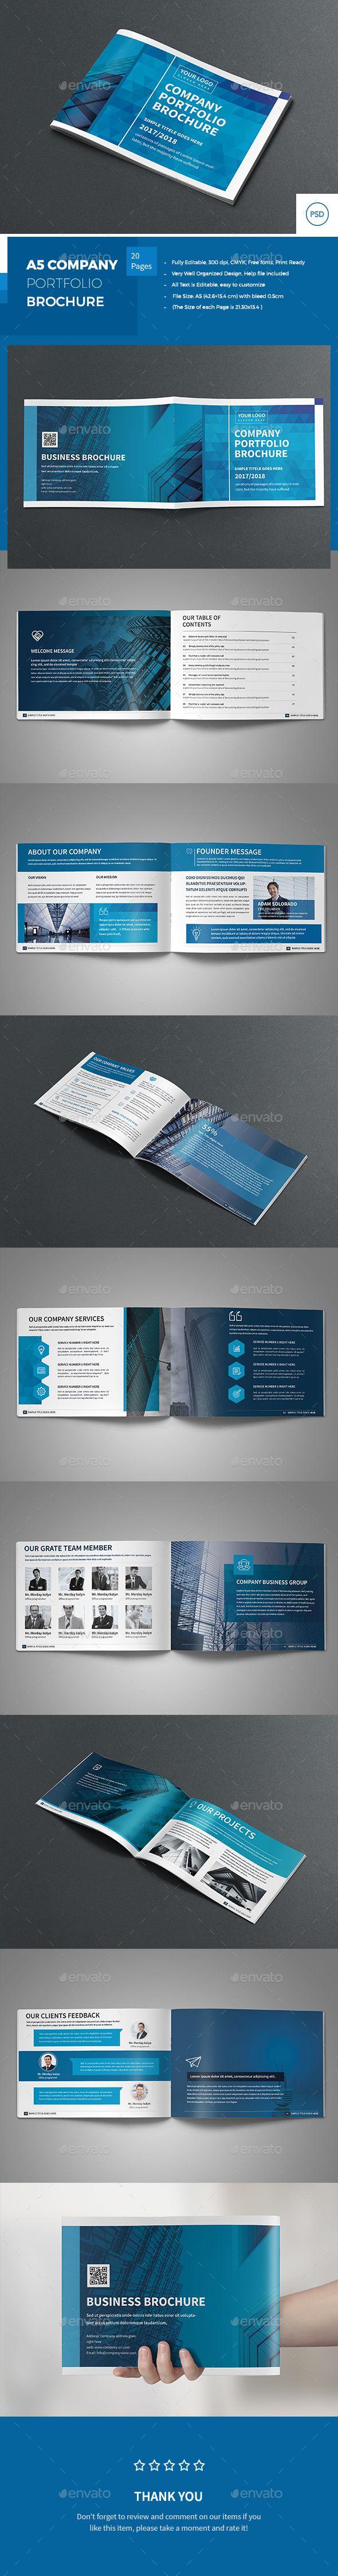 A5 Company Portfolio Brochure - #Corporate #Brochures Download here: https://graphicriver.net/item/a5-company-portfolio-brochure/19727856?ref=alena994